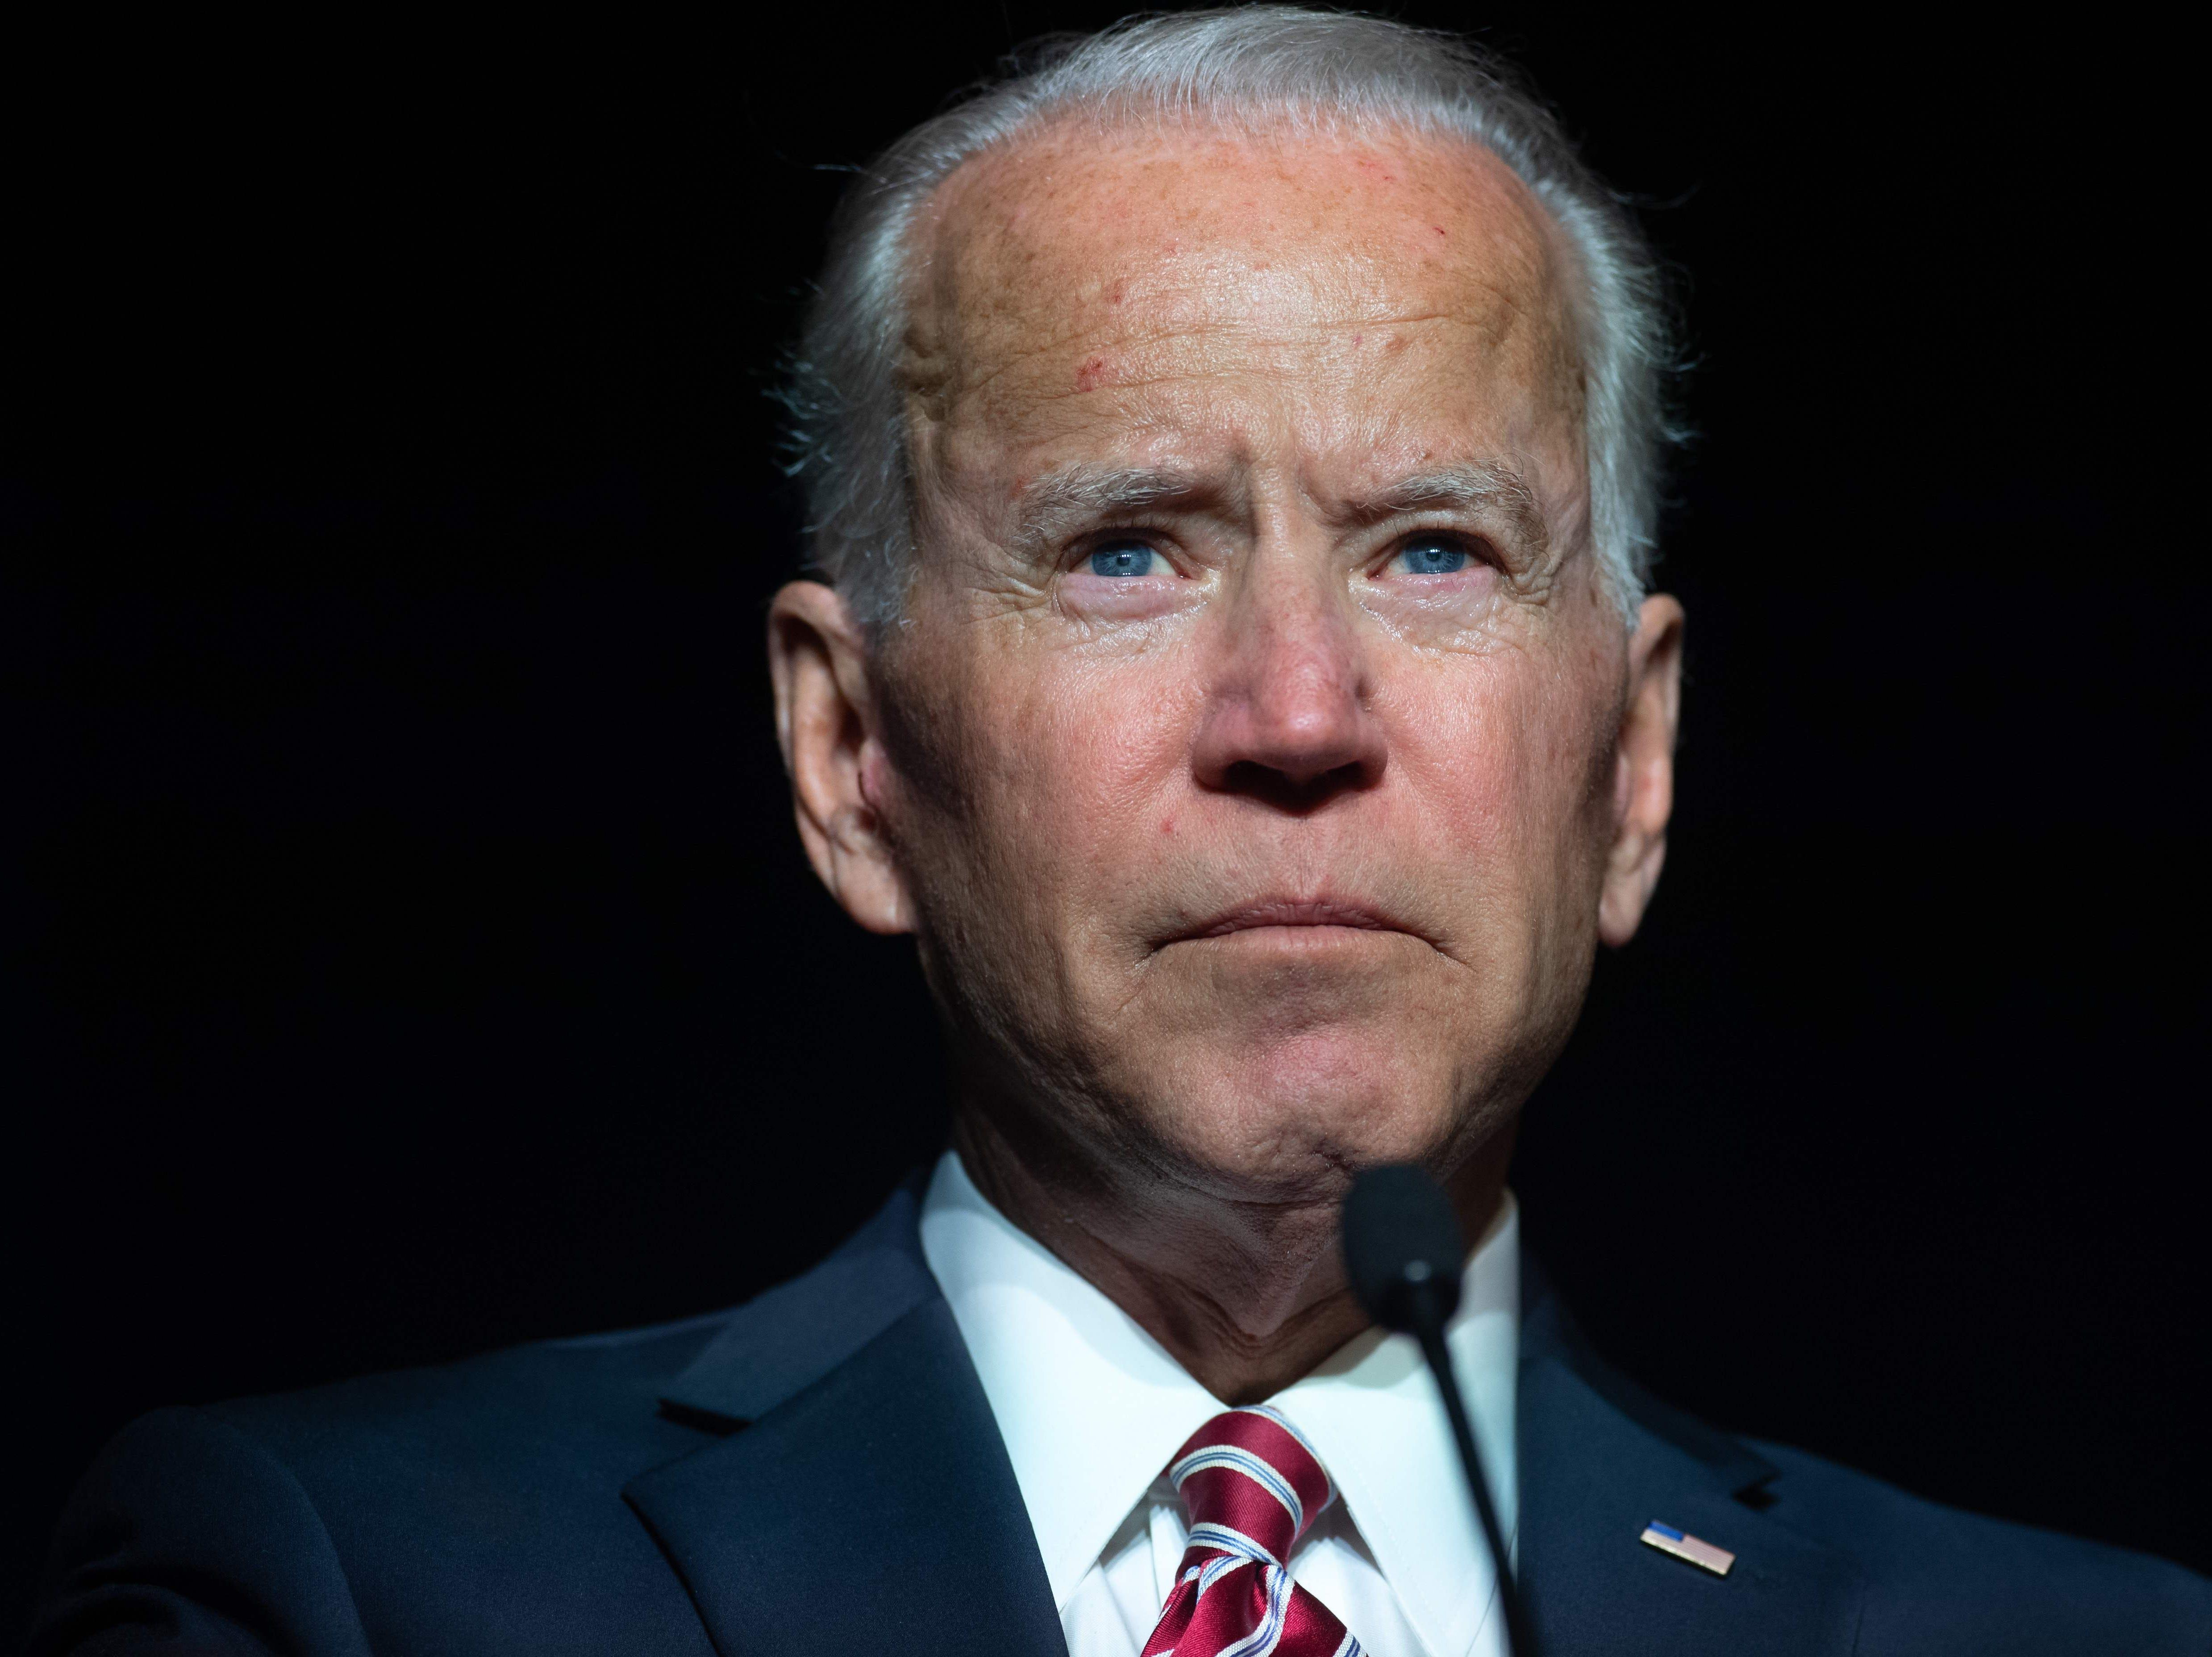 I hope Joe Biden runs for president. After Donald Trump, we need a compassionate leader.